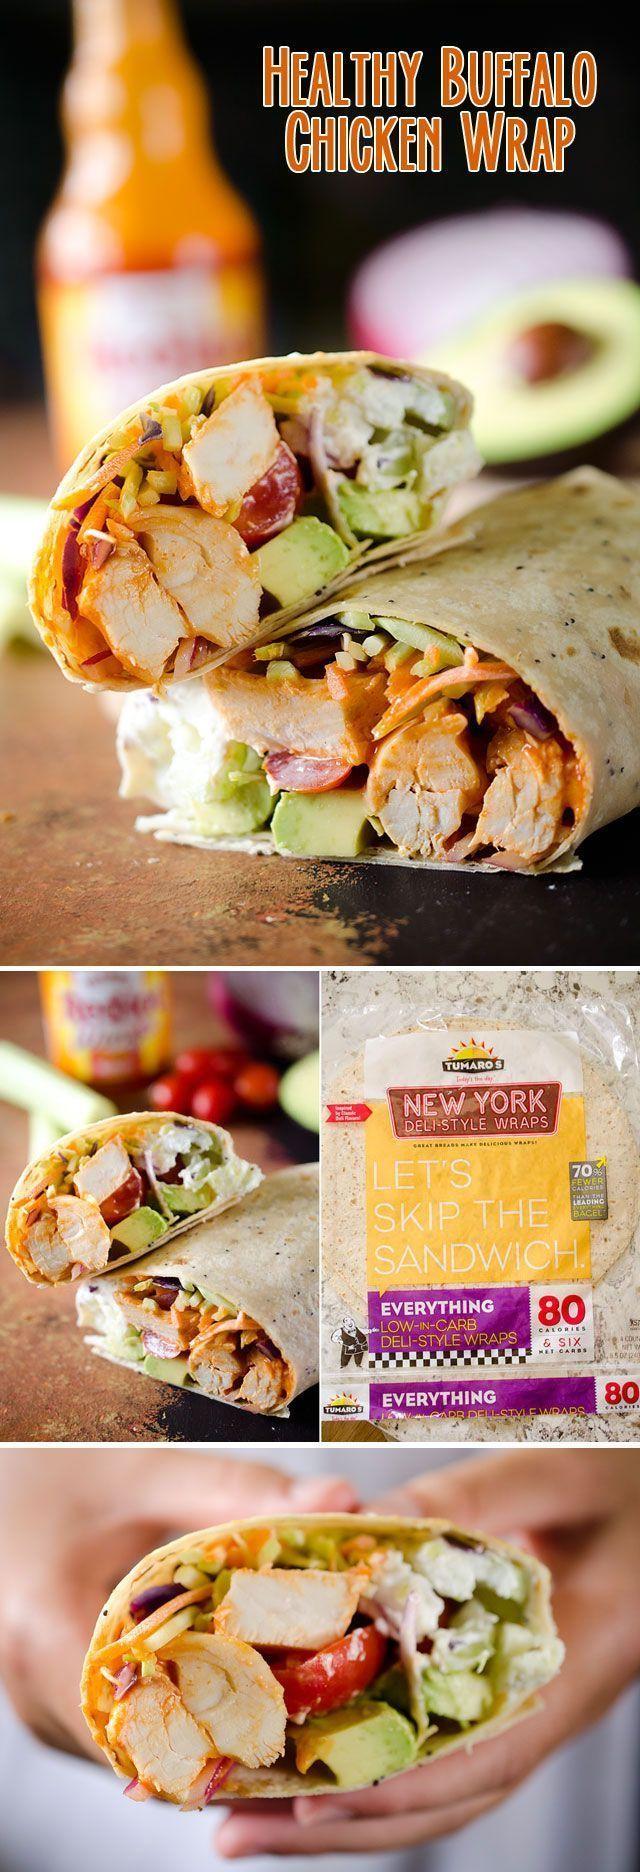 Healthy Buffalo Chicken Wrap - A light and healthy wrap filled with buffalo chic... #buffalo #chicke...